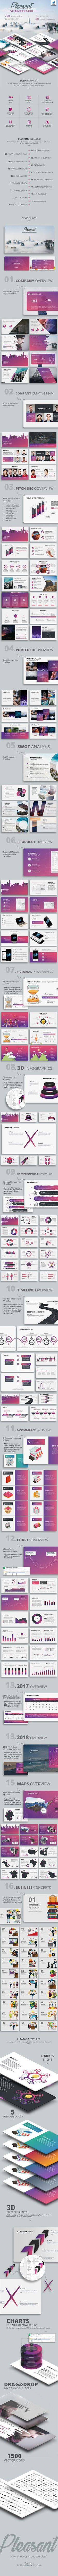 Pleasant Google Slides Template - Google Slides Presentation Templates